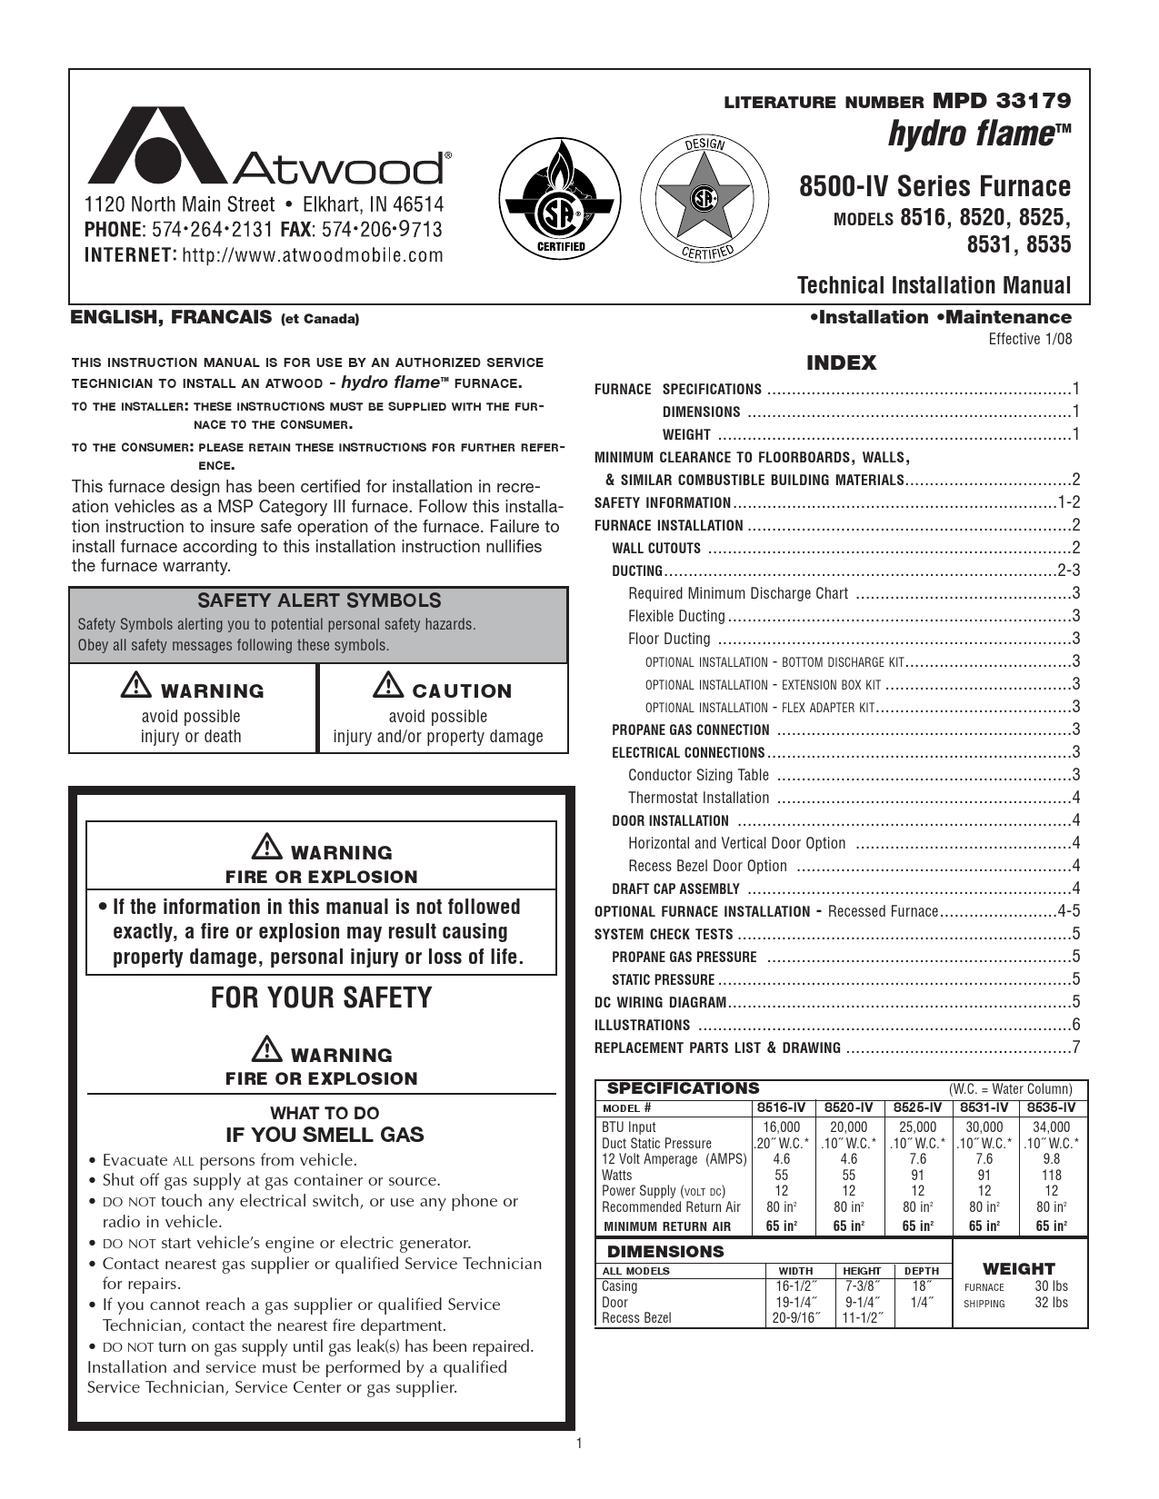 atwood hyda flame operating manual